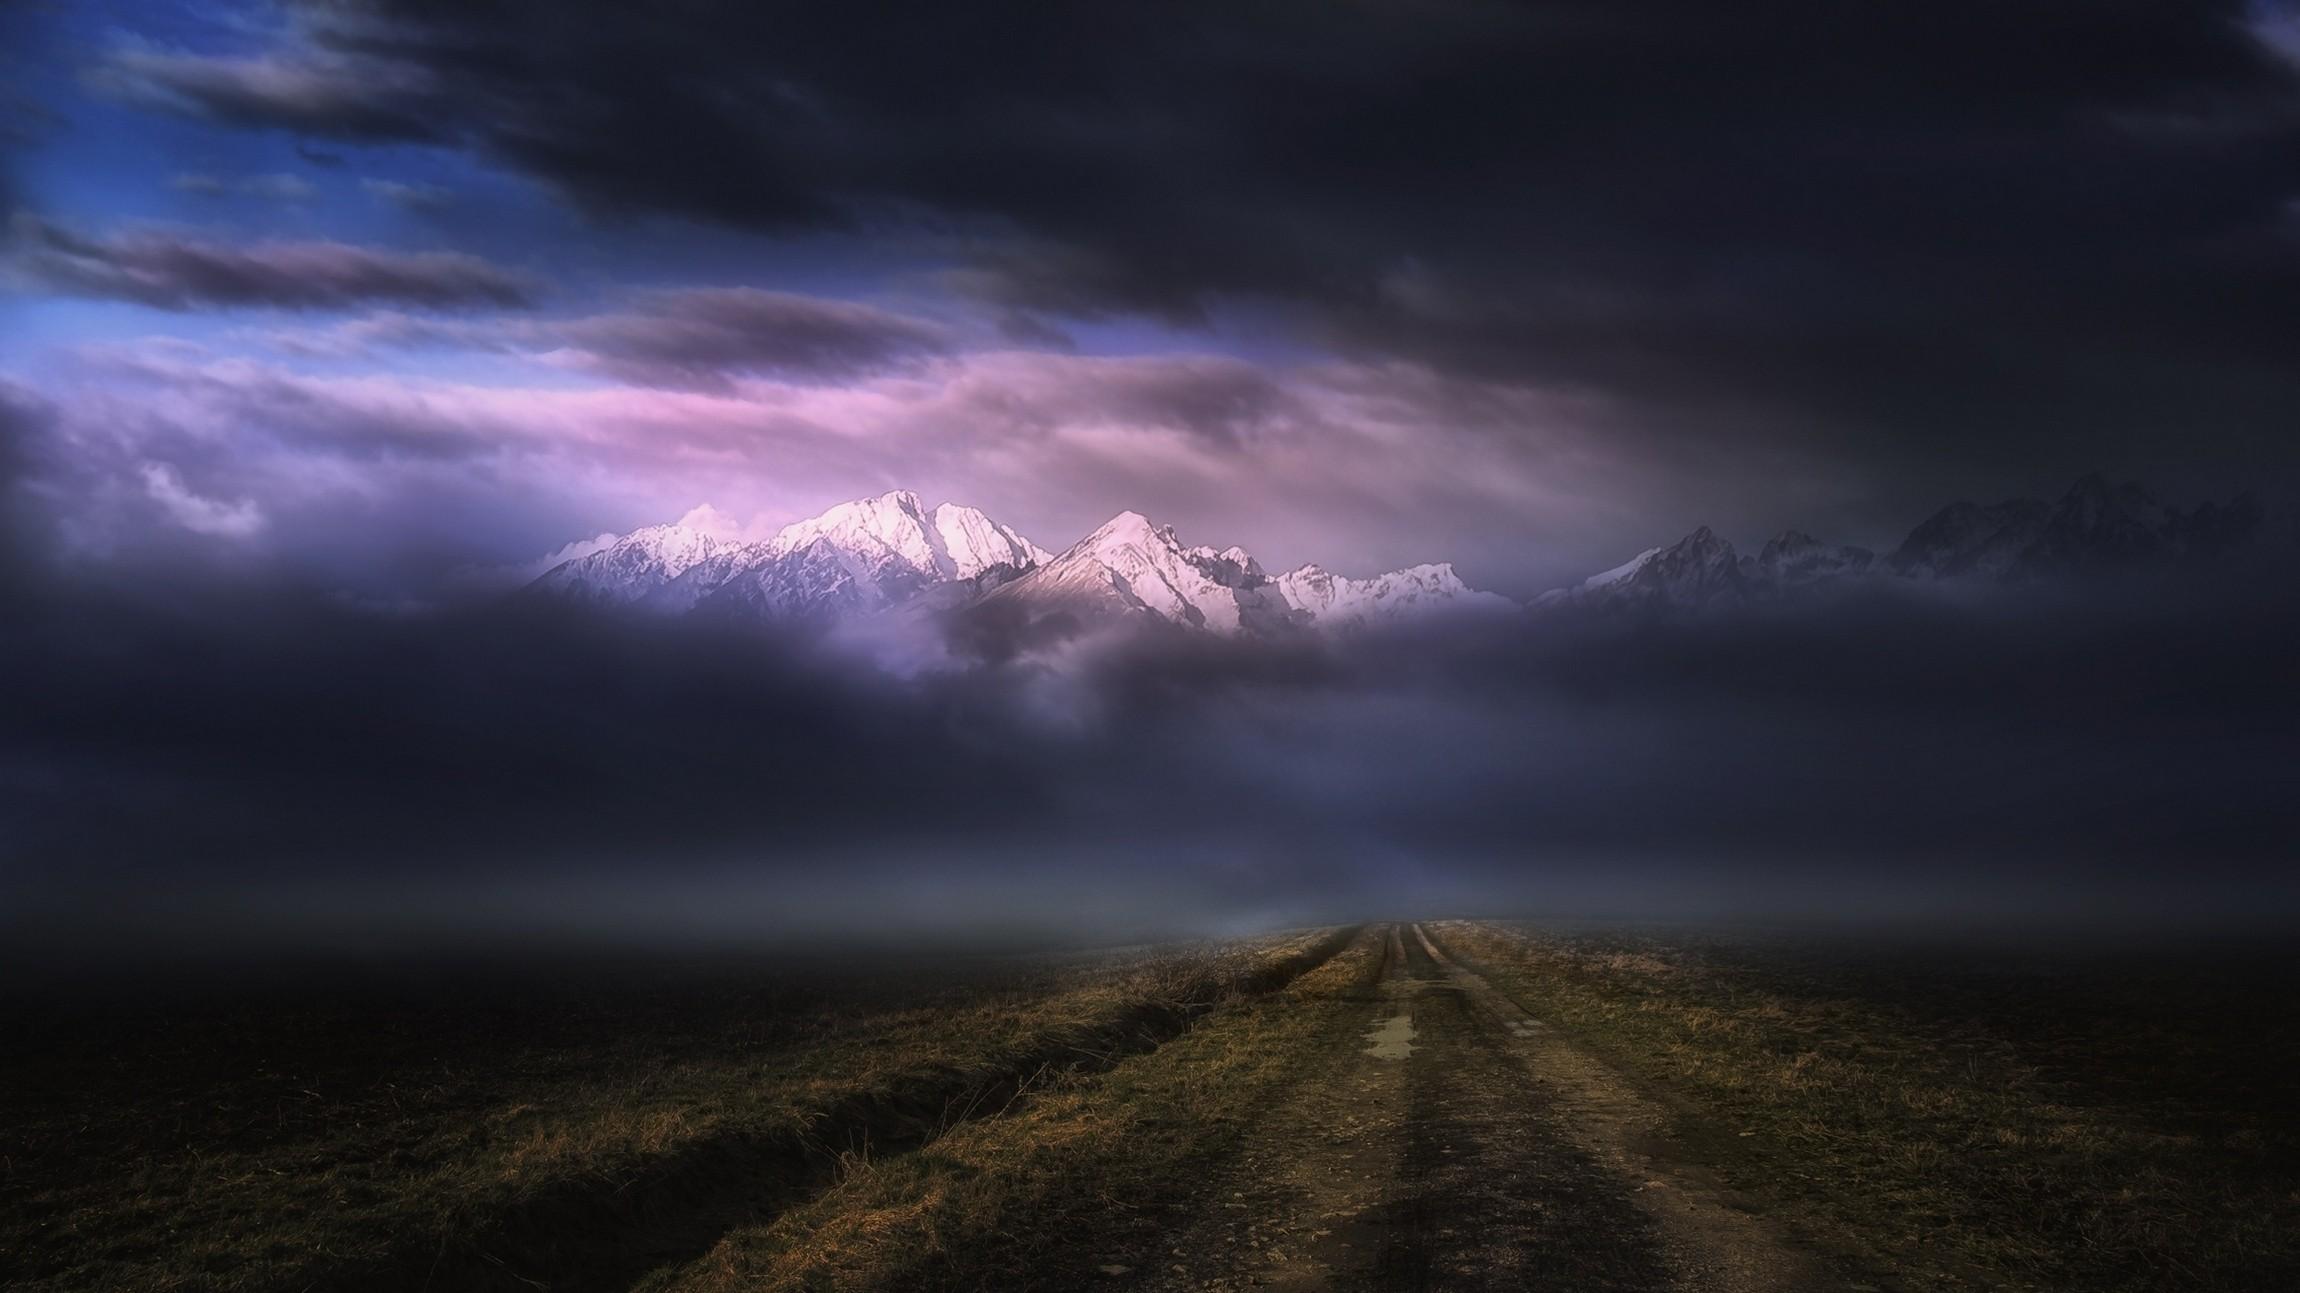 Sunlight Mist Dirt Road Sunset Clouds Snowy Peak